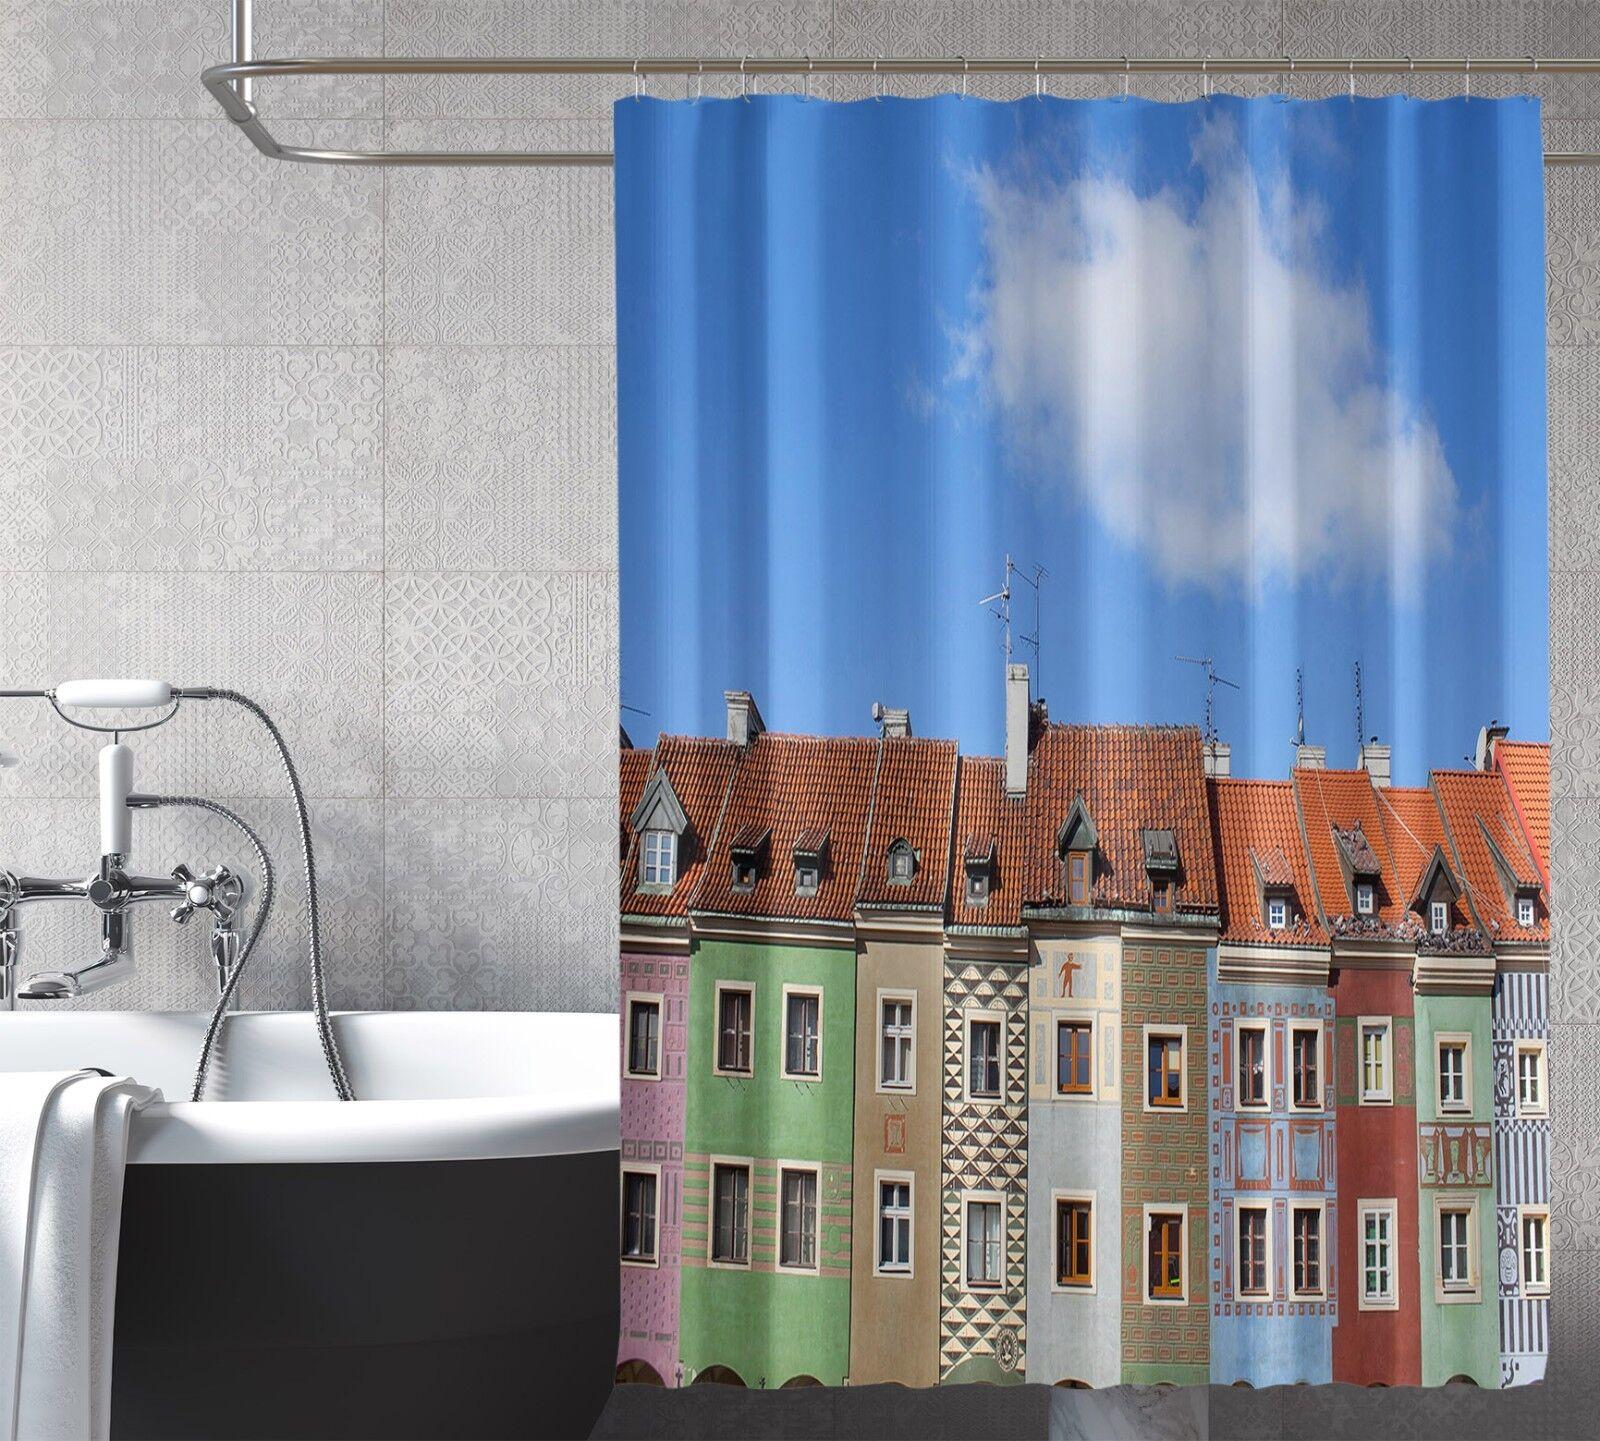 Borrar 3d casa 31 cortina de ducha impermeable fibra baño en casa Windows inodoro de